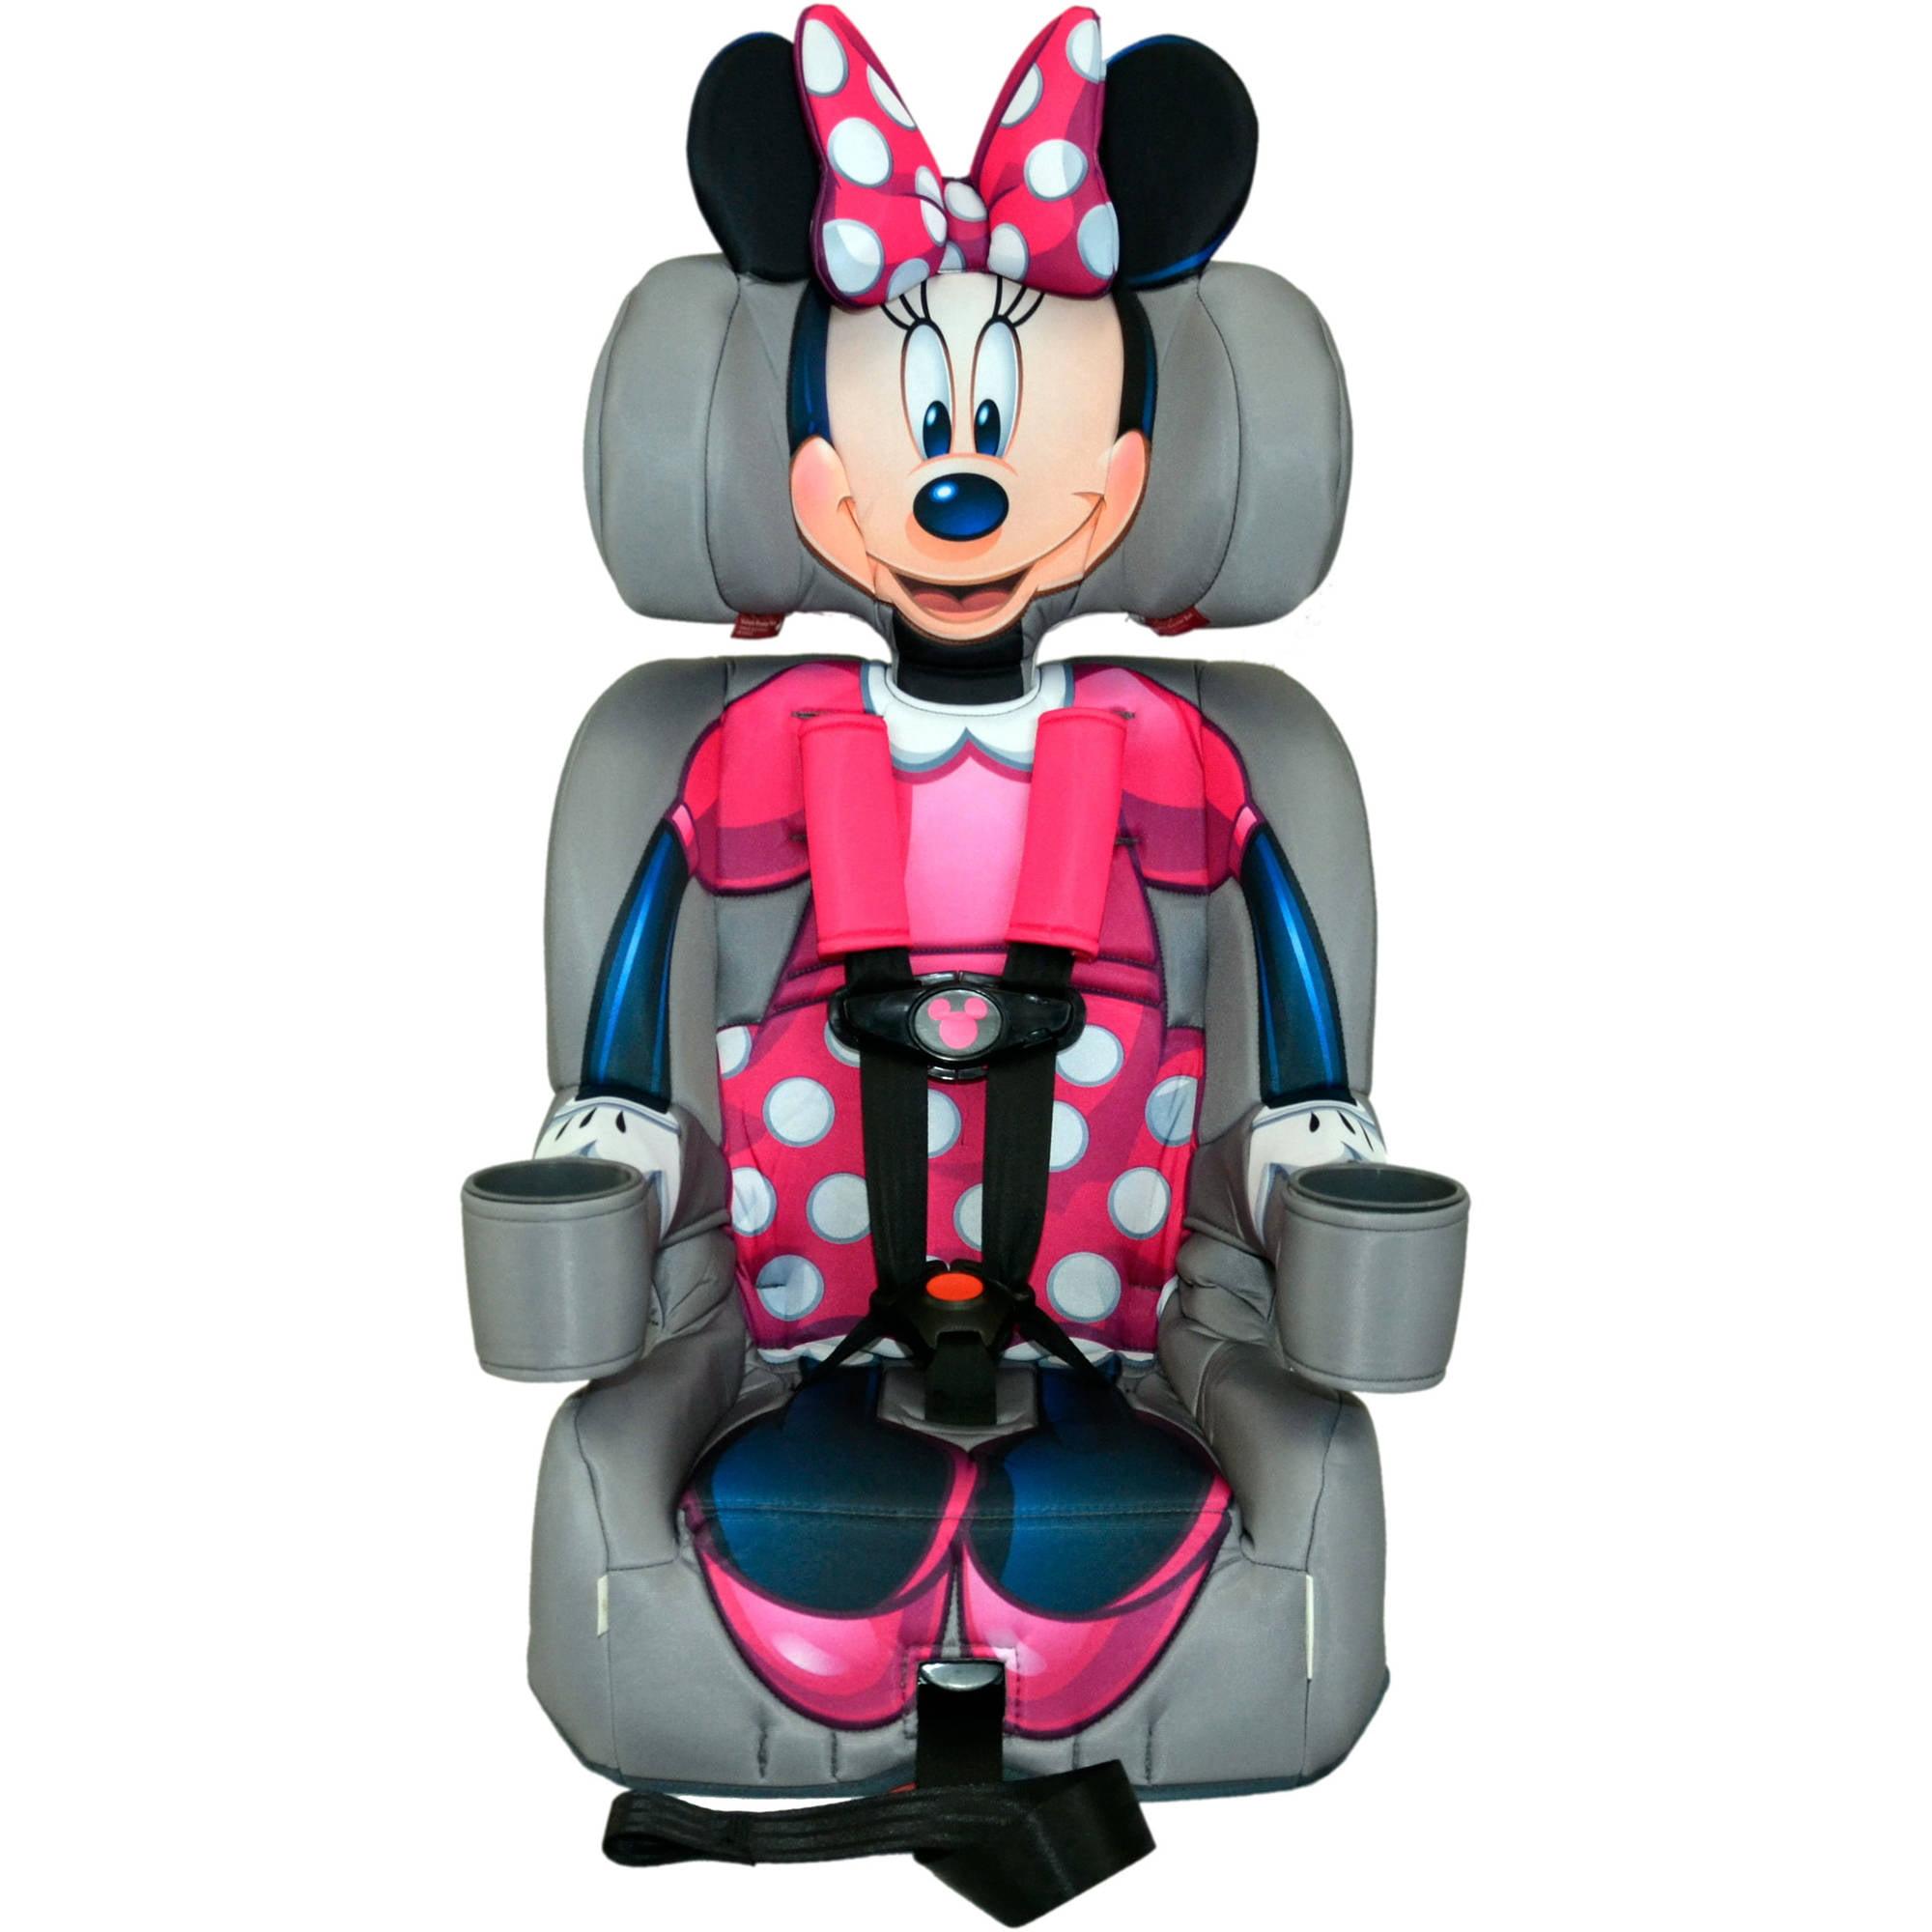 Car Seats Com Source Walmart Cp 91365 Kentucky Seat Laws